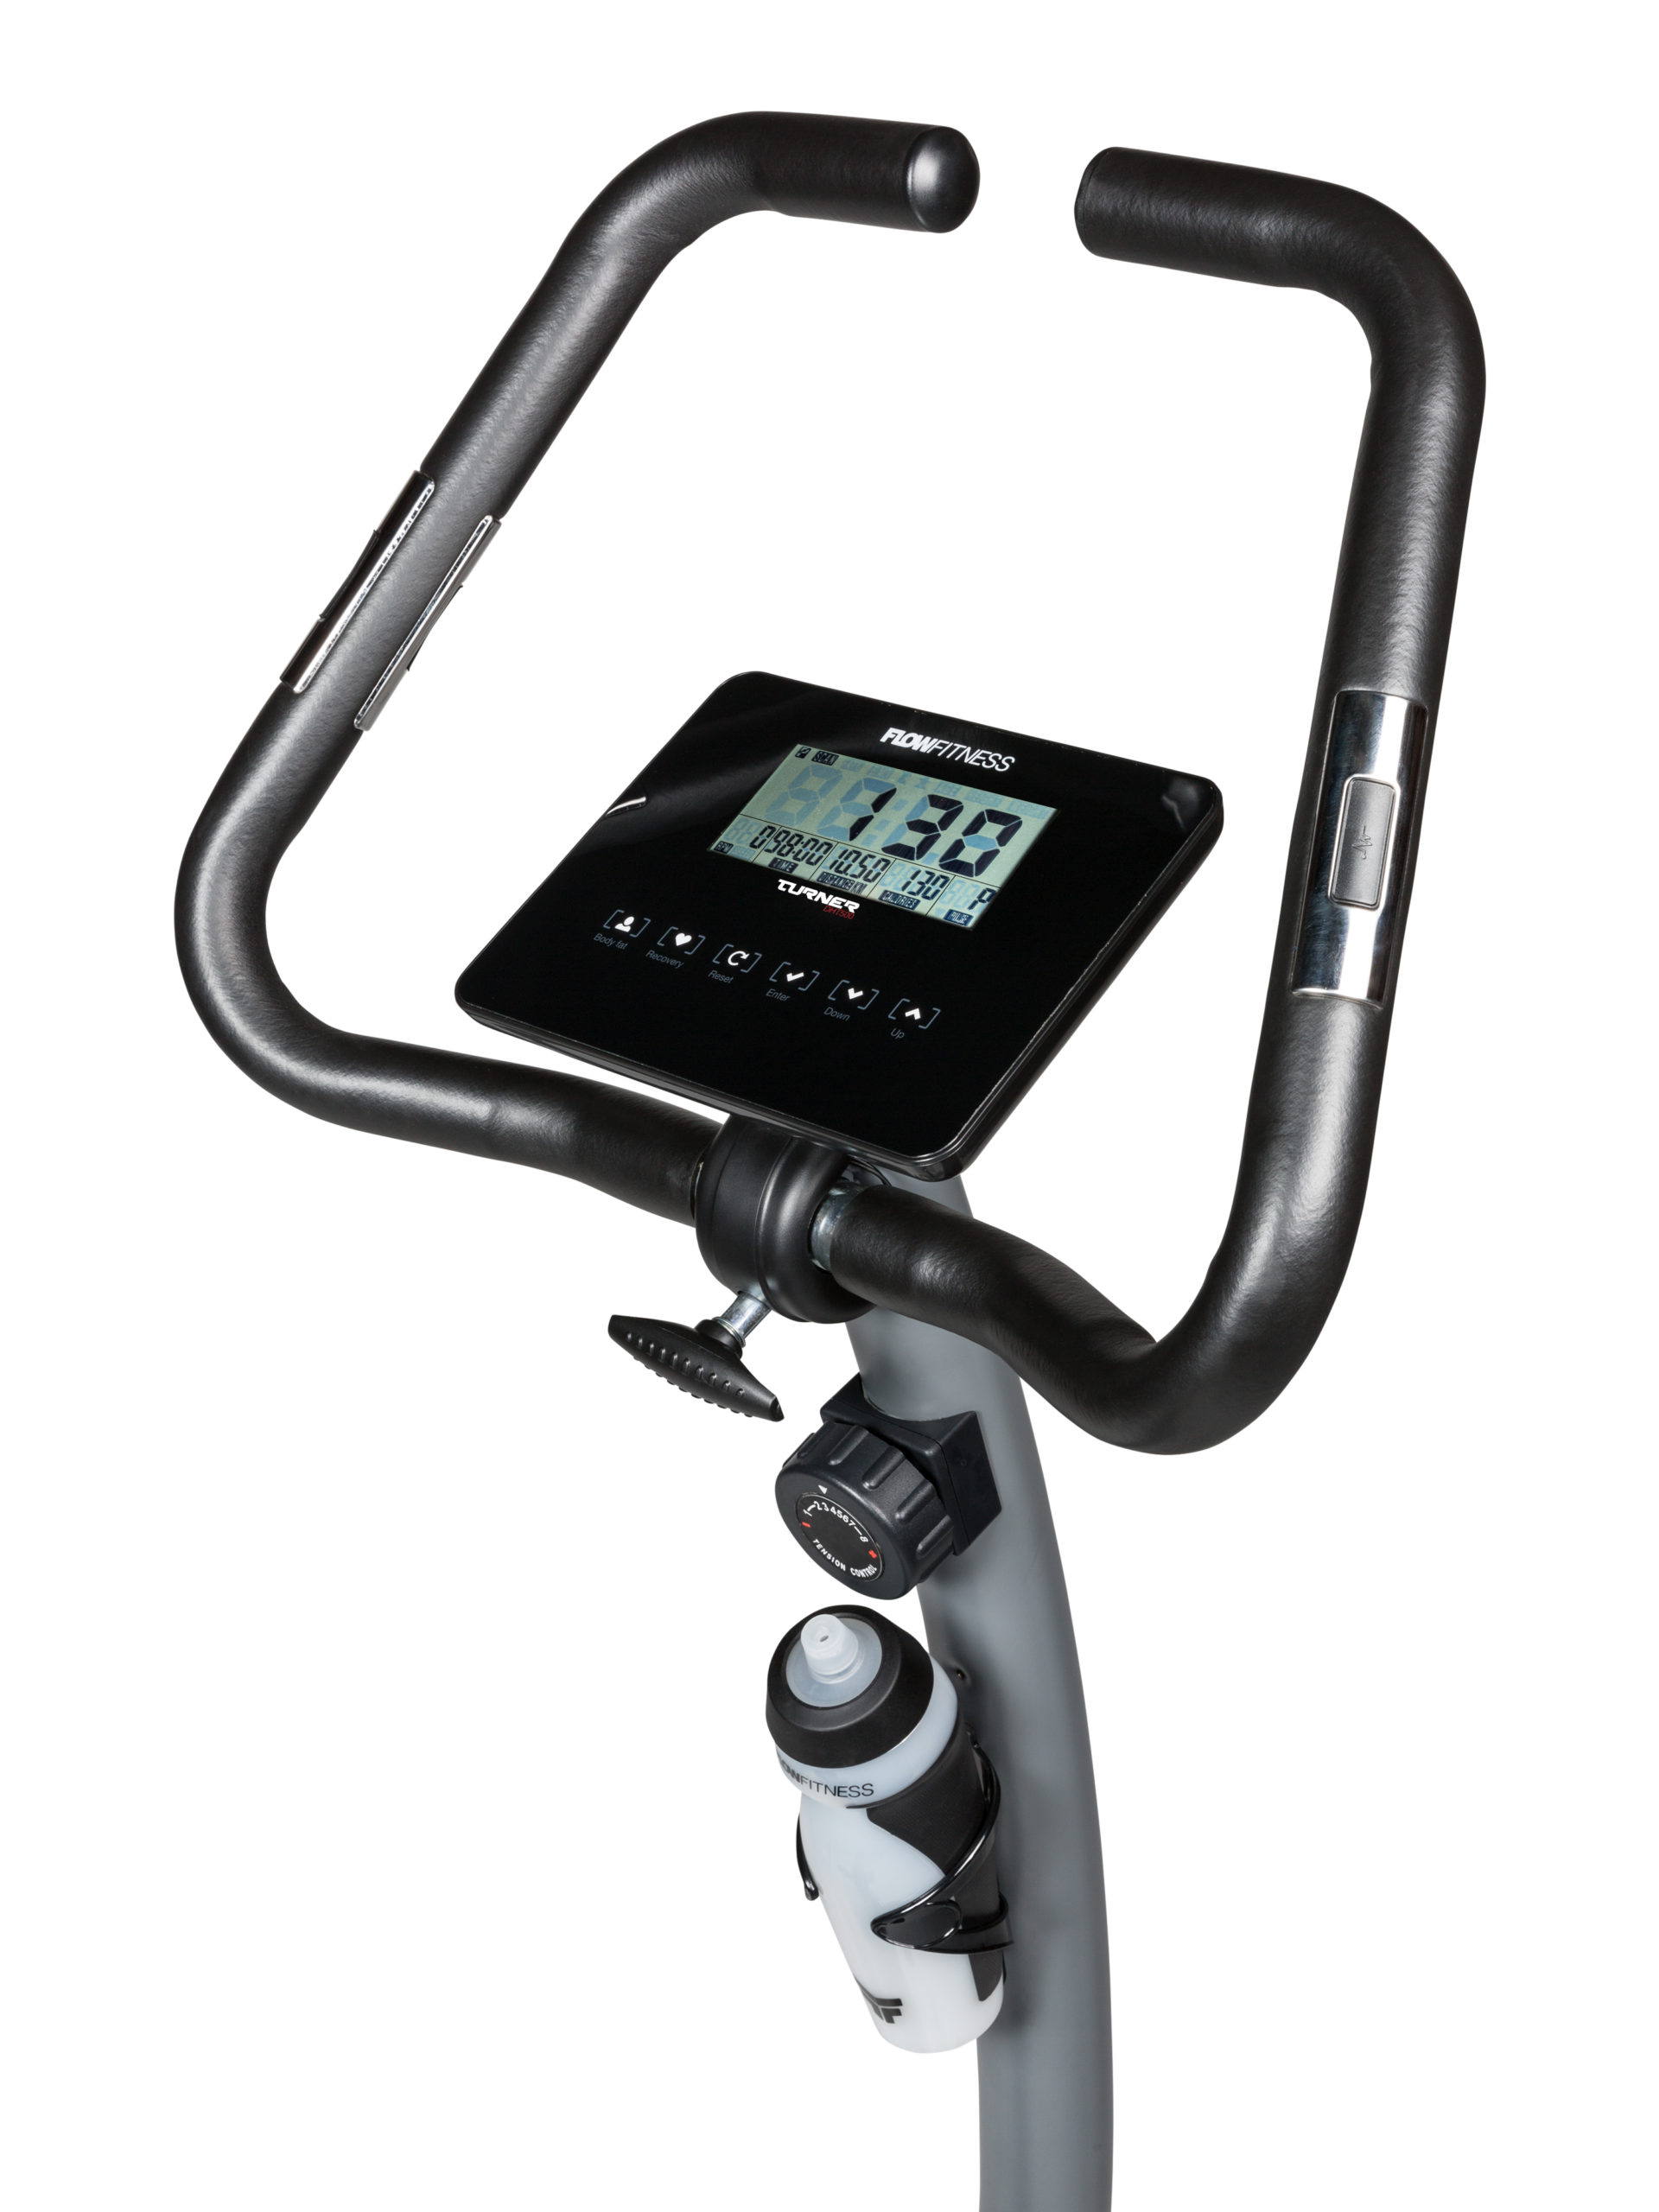 Flow Fitness Tabel Turner DHT500 Hometrainer 5